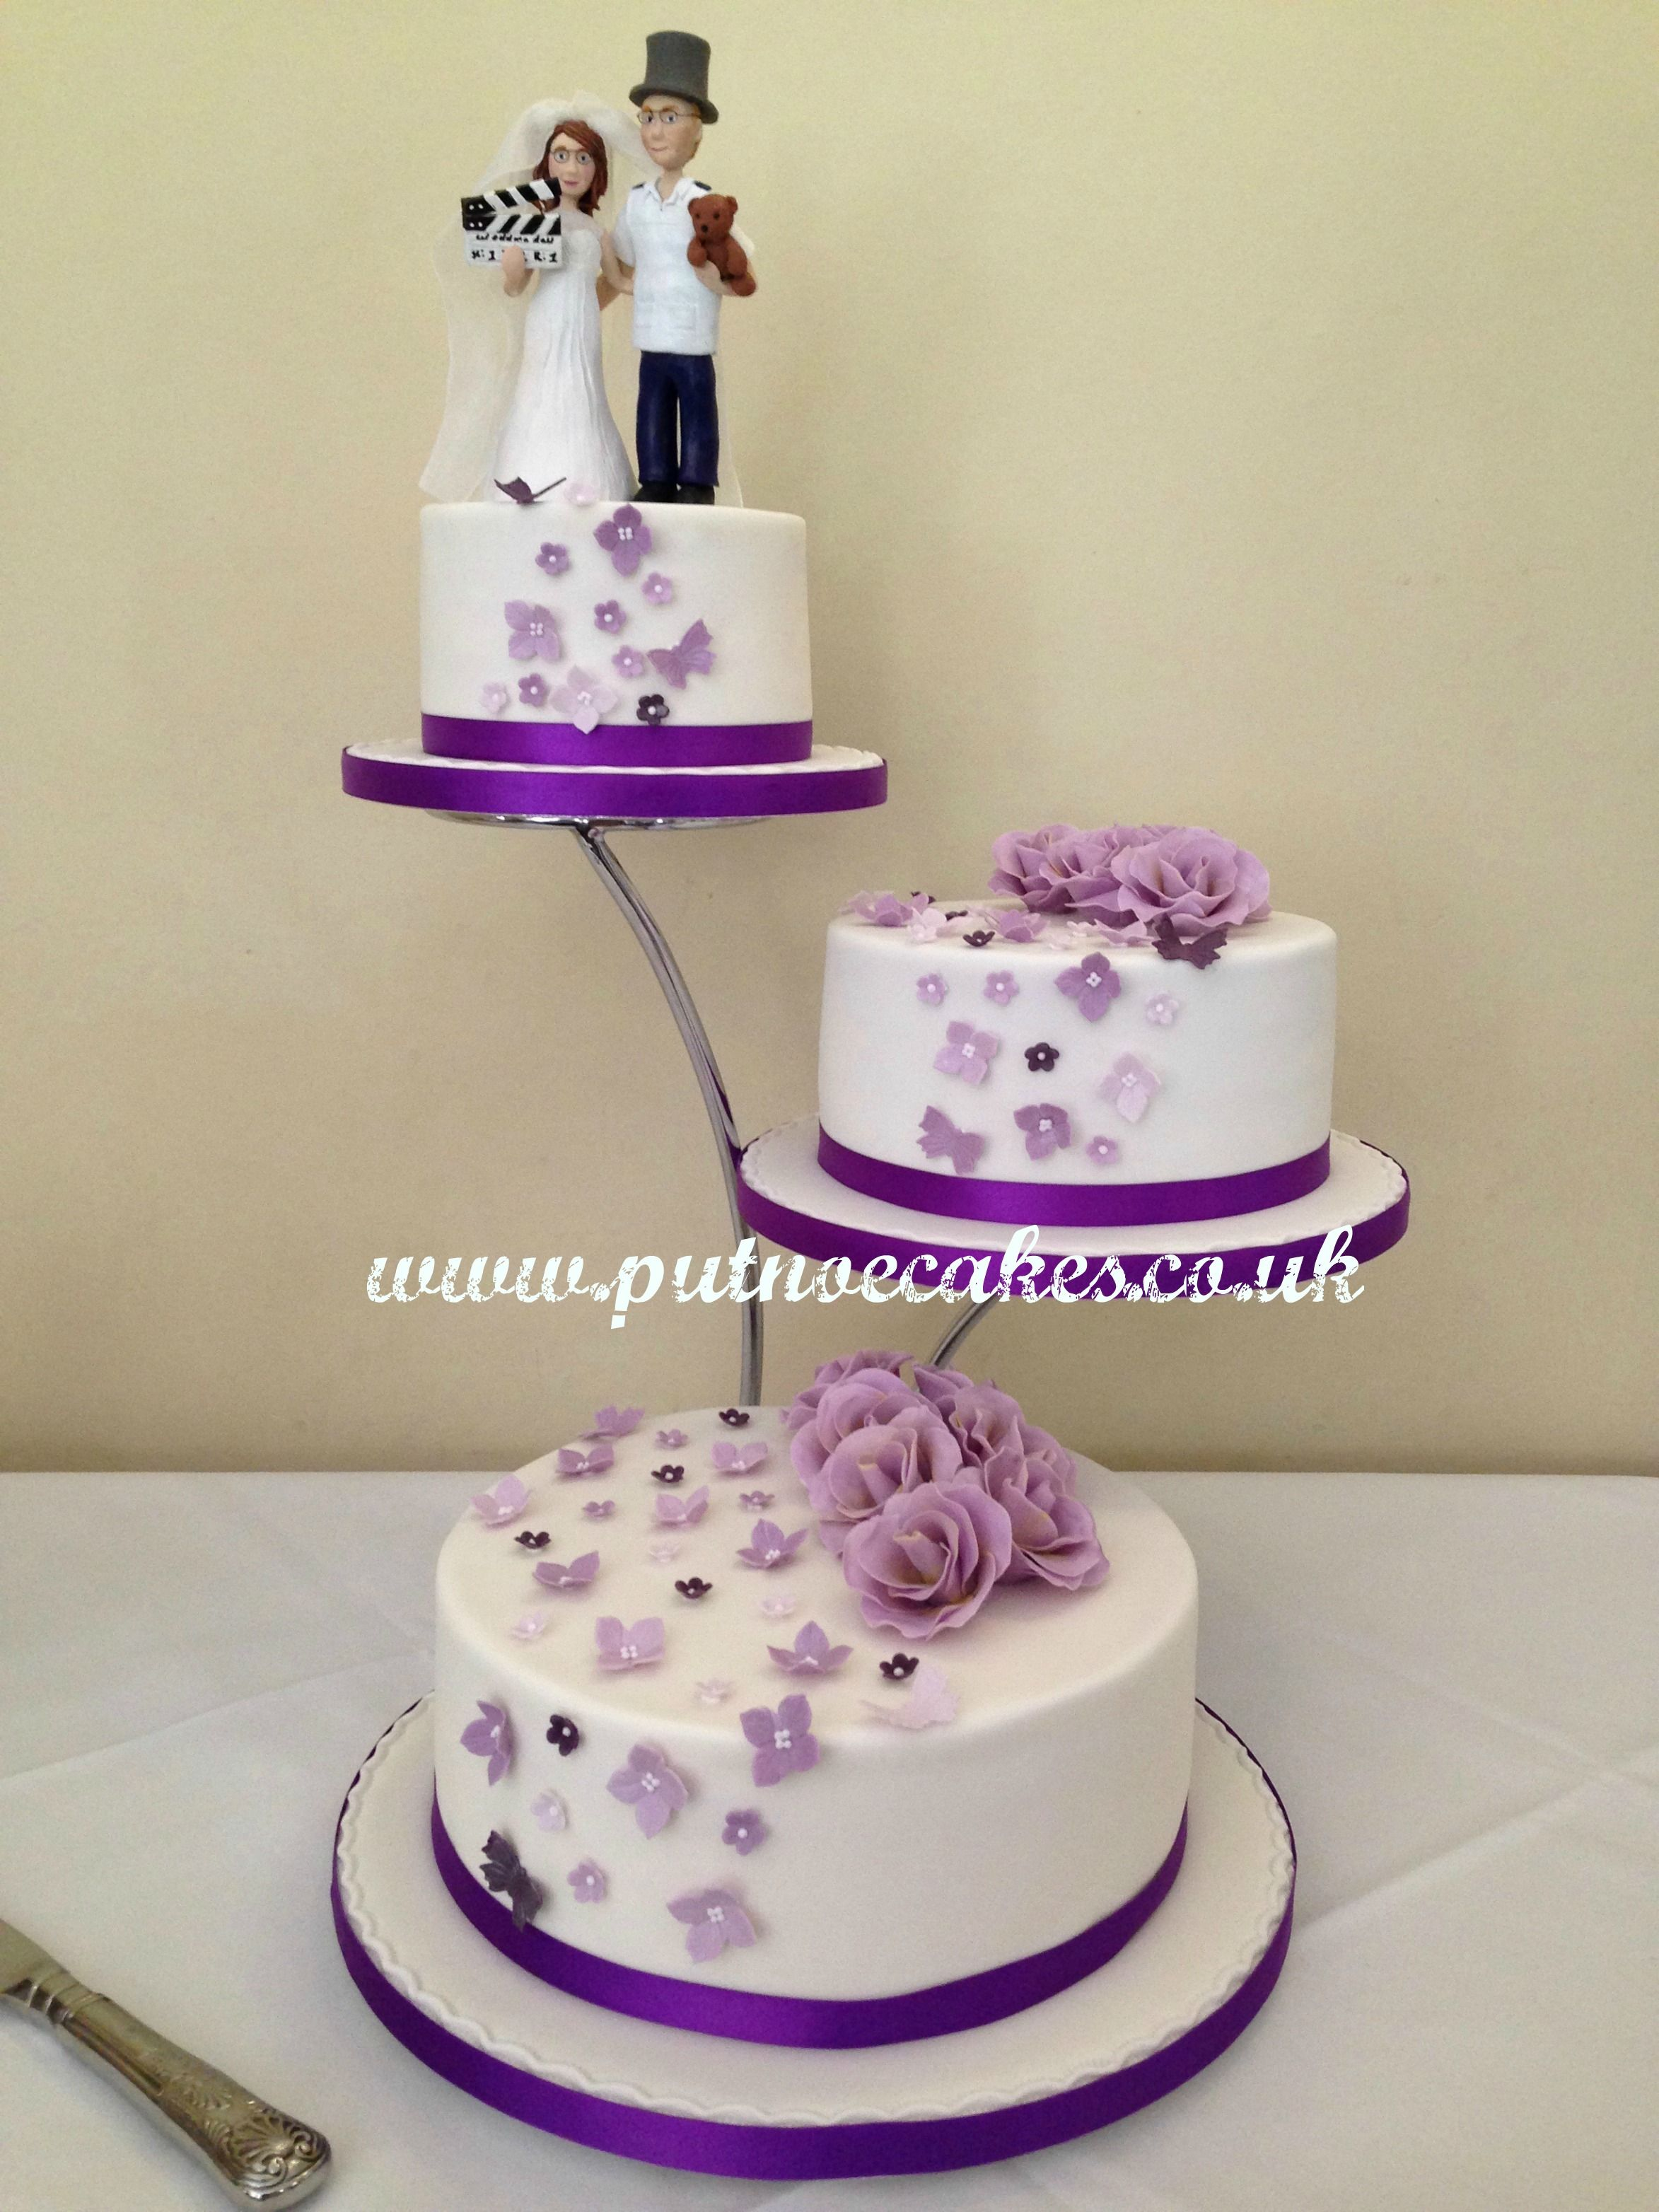 Separator Stand 3 Tier Wedding Cake Bride And Groom